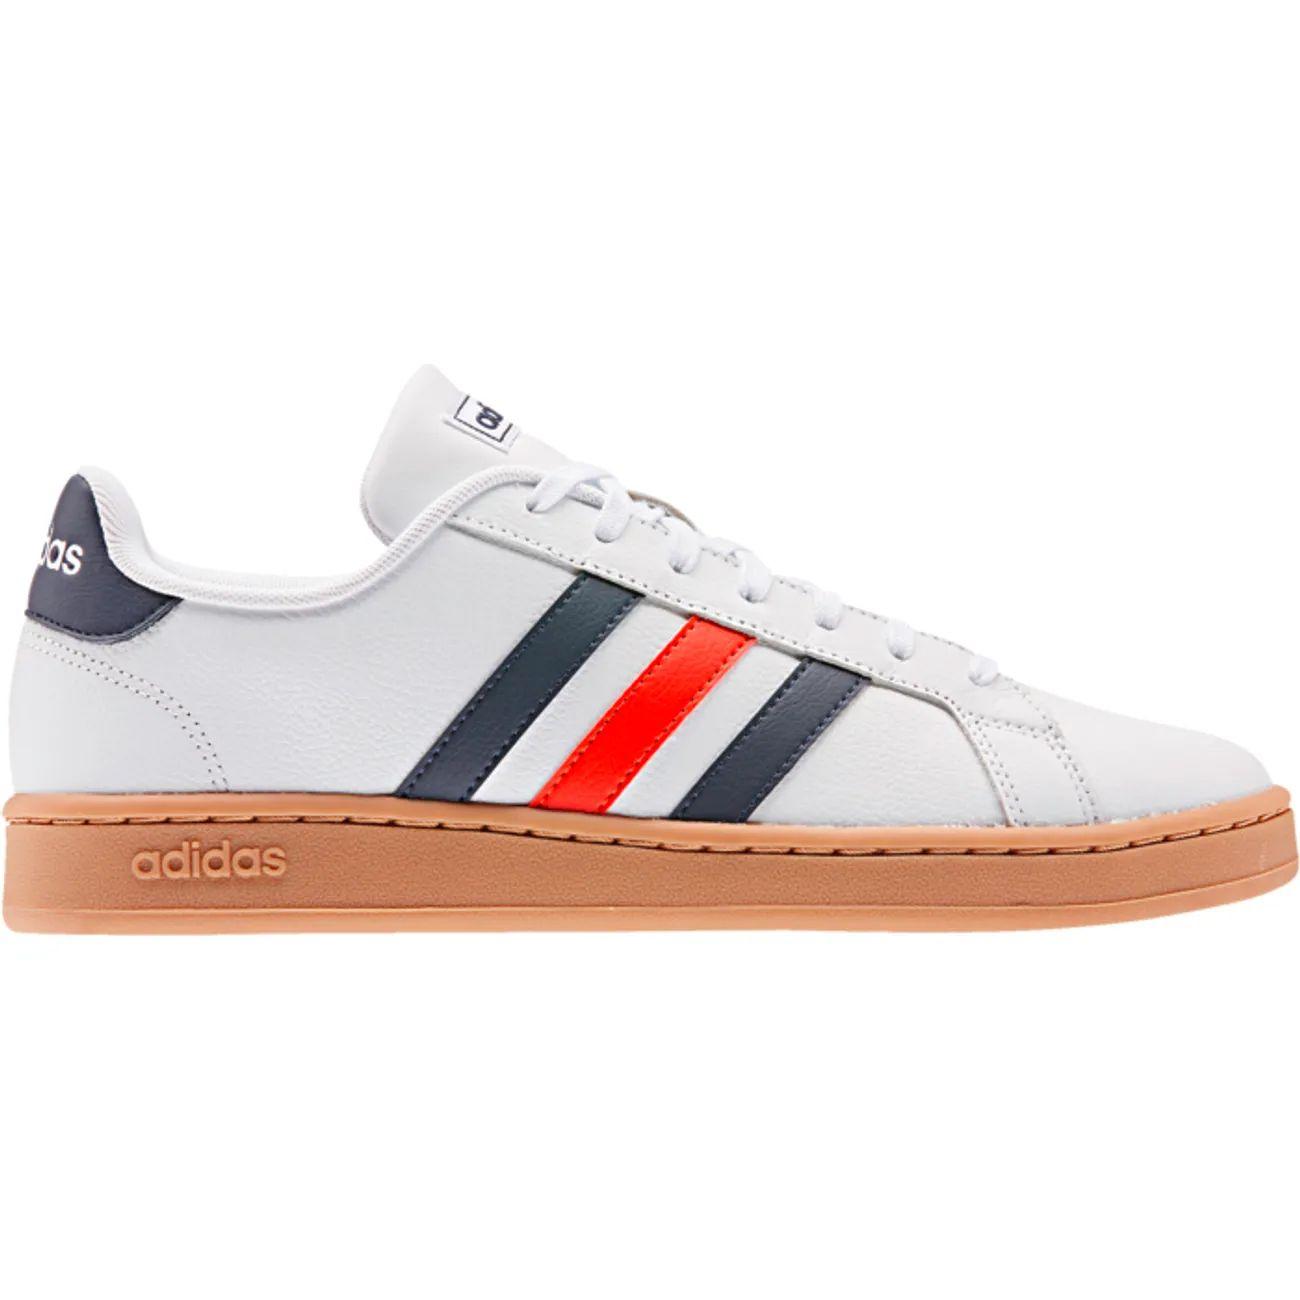 Basket Adidas Grand Court I - Tailles 40, 45 1/3, 46